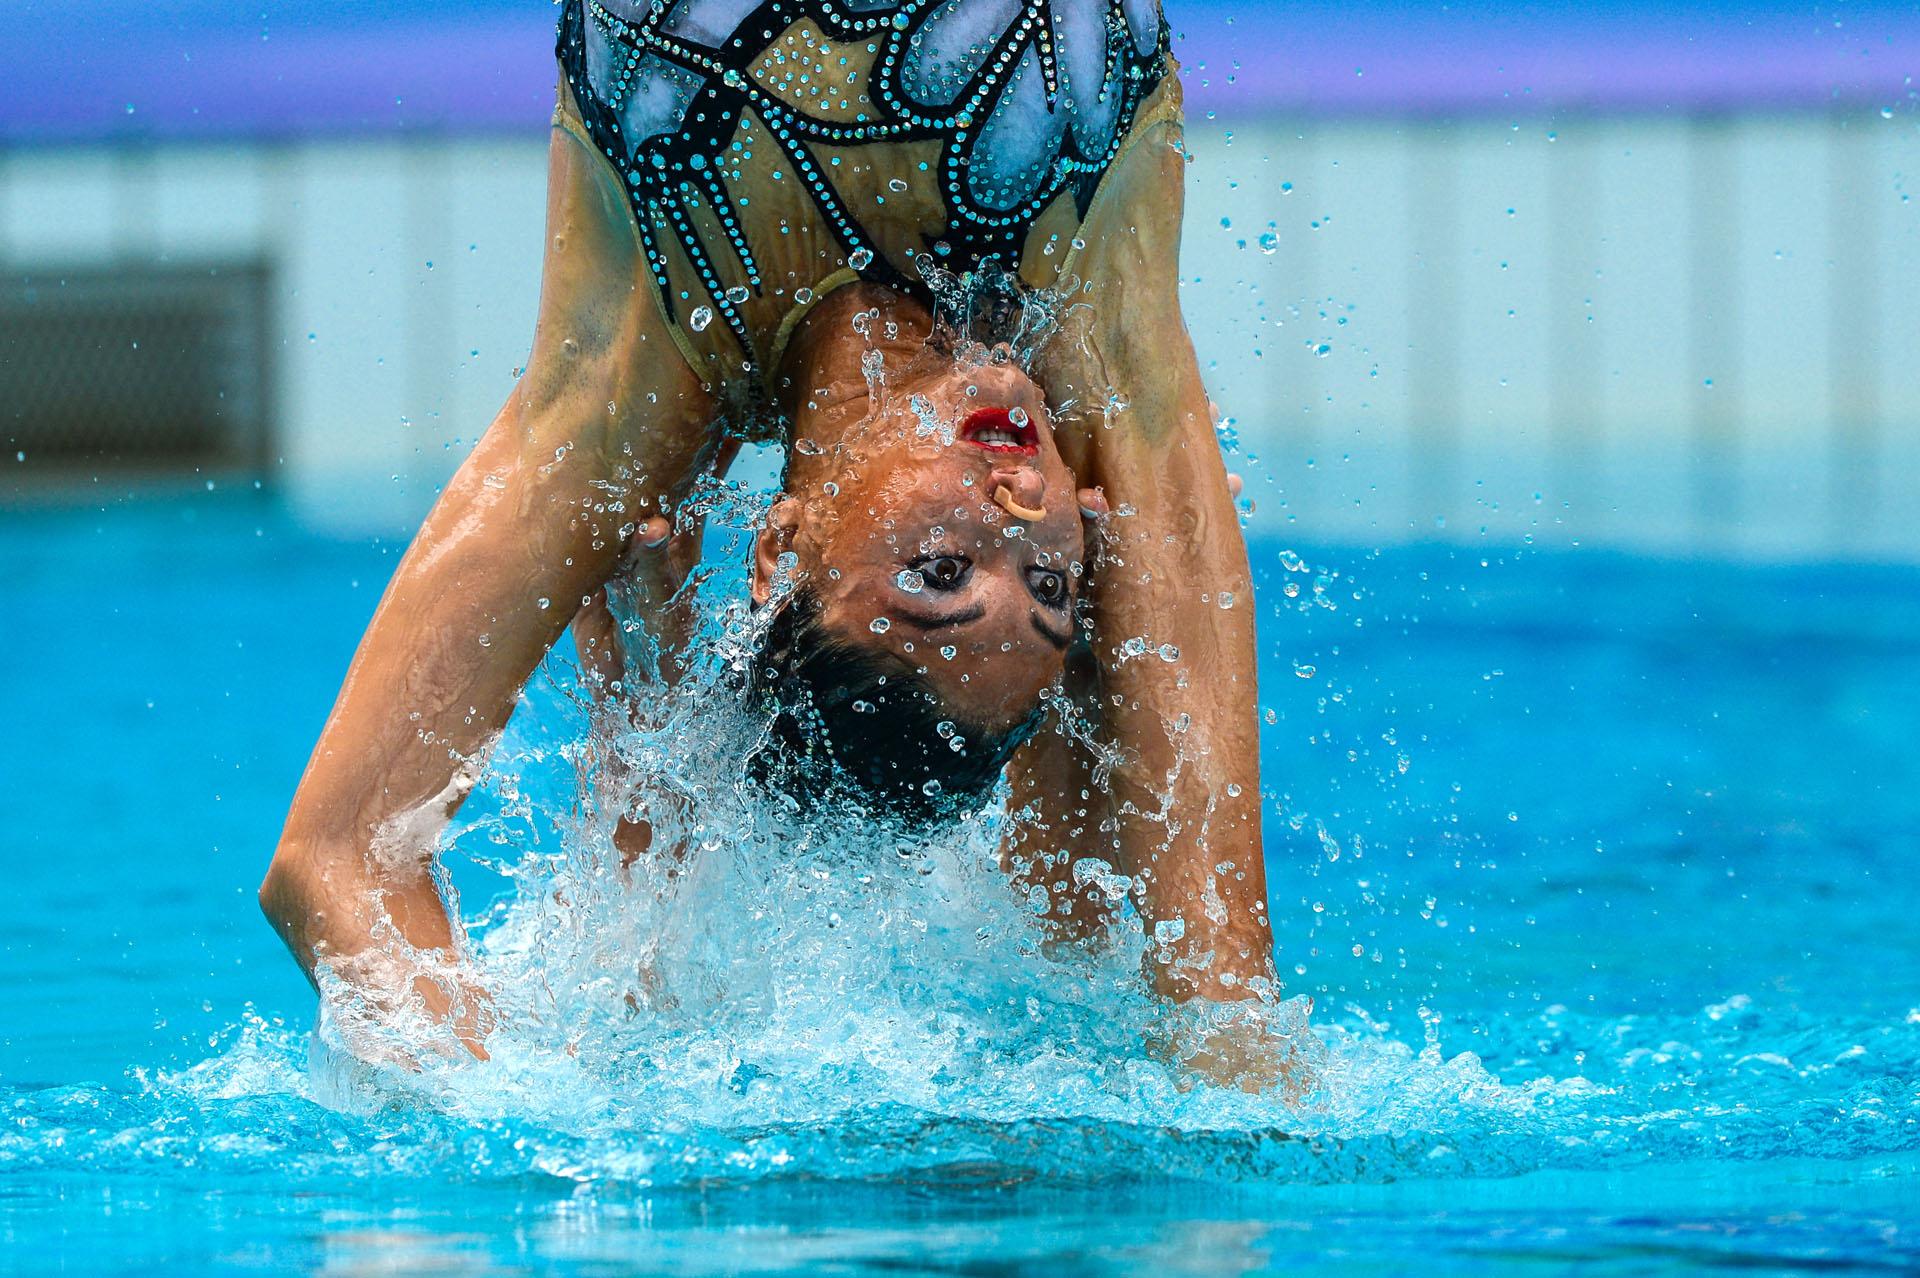 03/03/2016. Test-Event. Nado Sincronizado. Synchronised Swimming